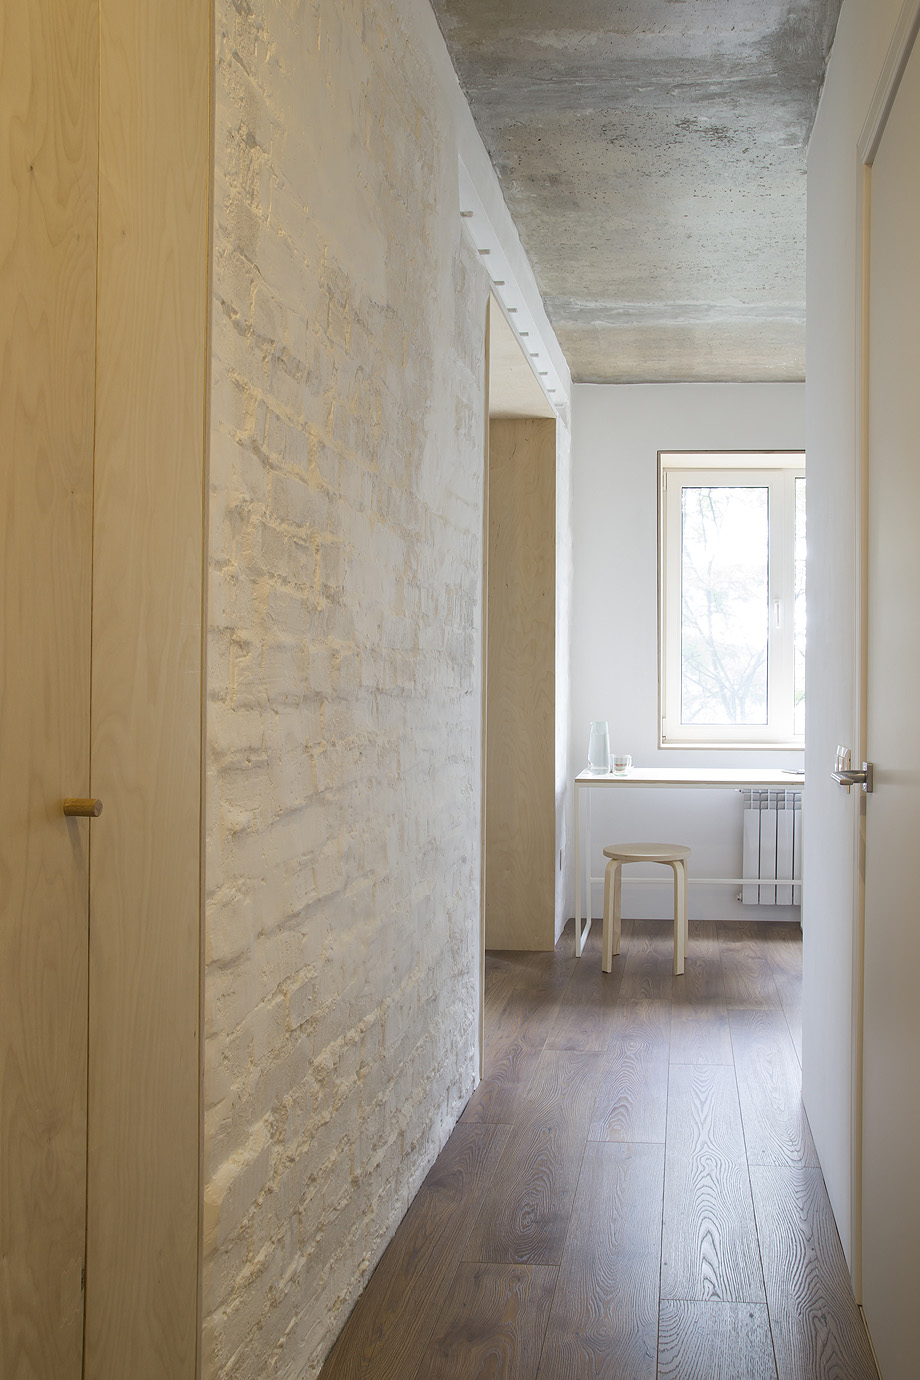 apartamento en rusia por kdva architects - foto daria koloskova (10)